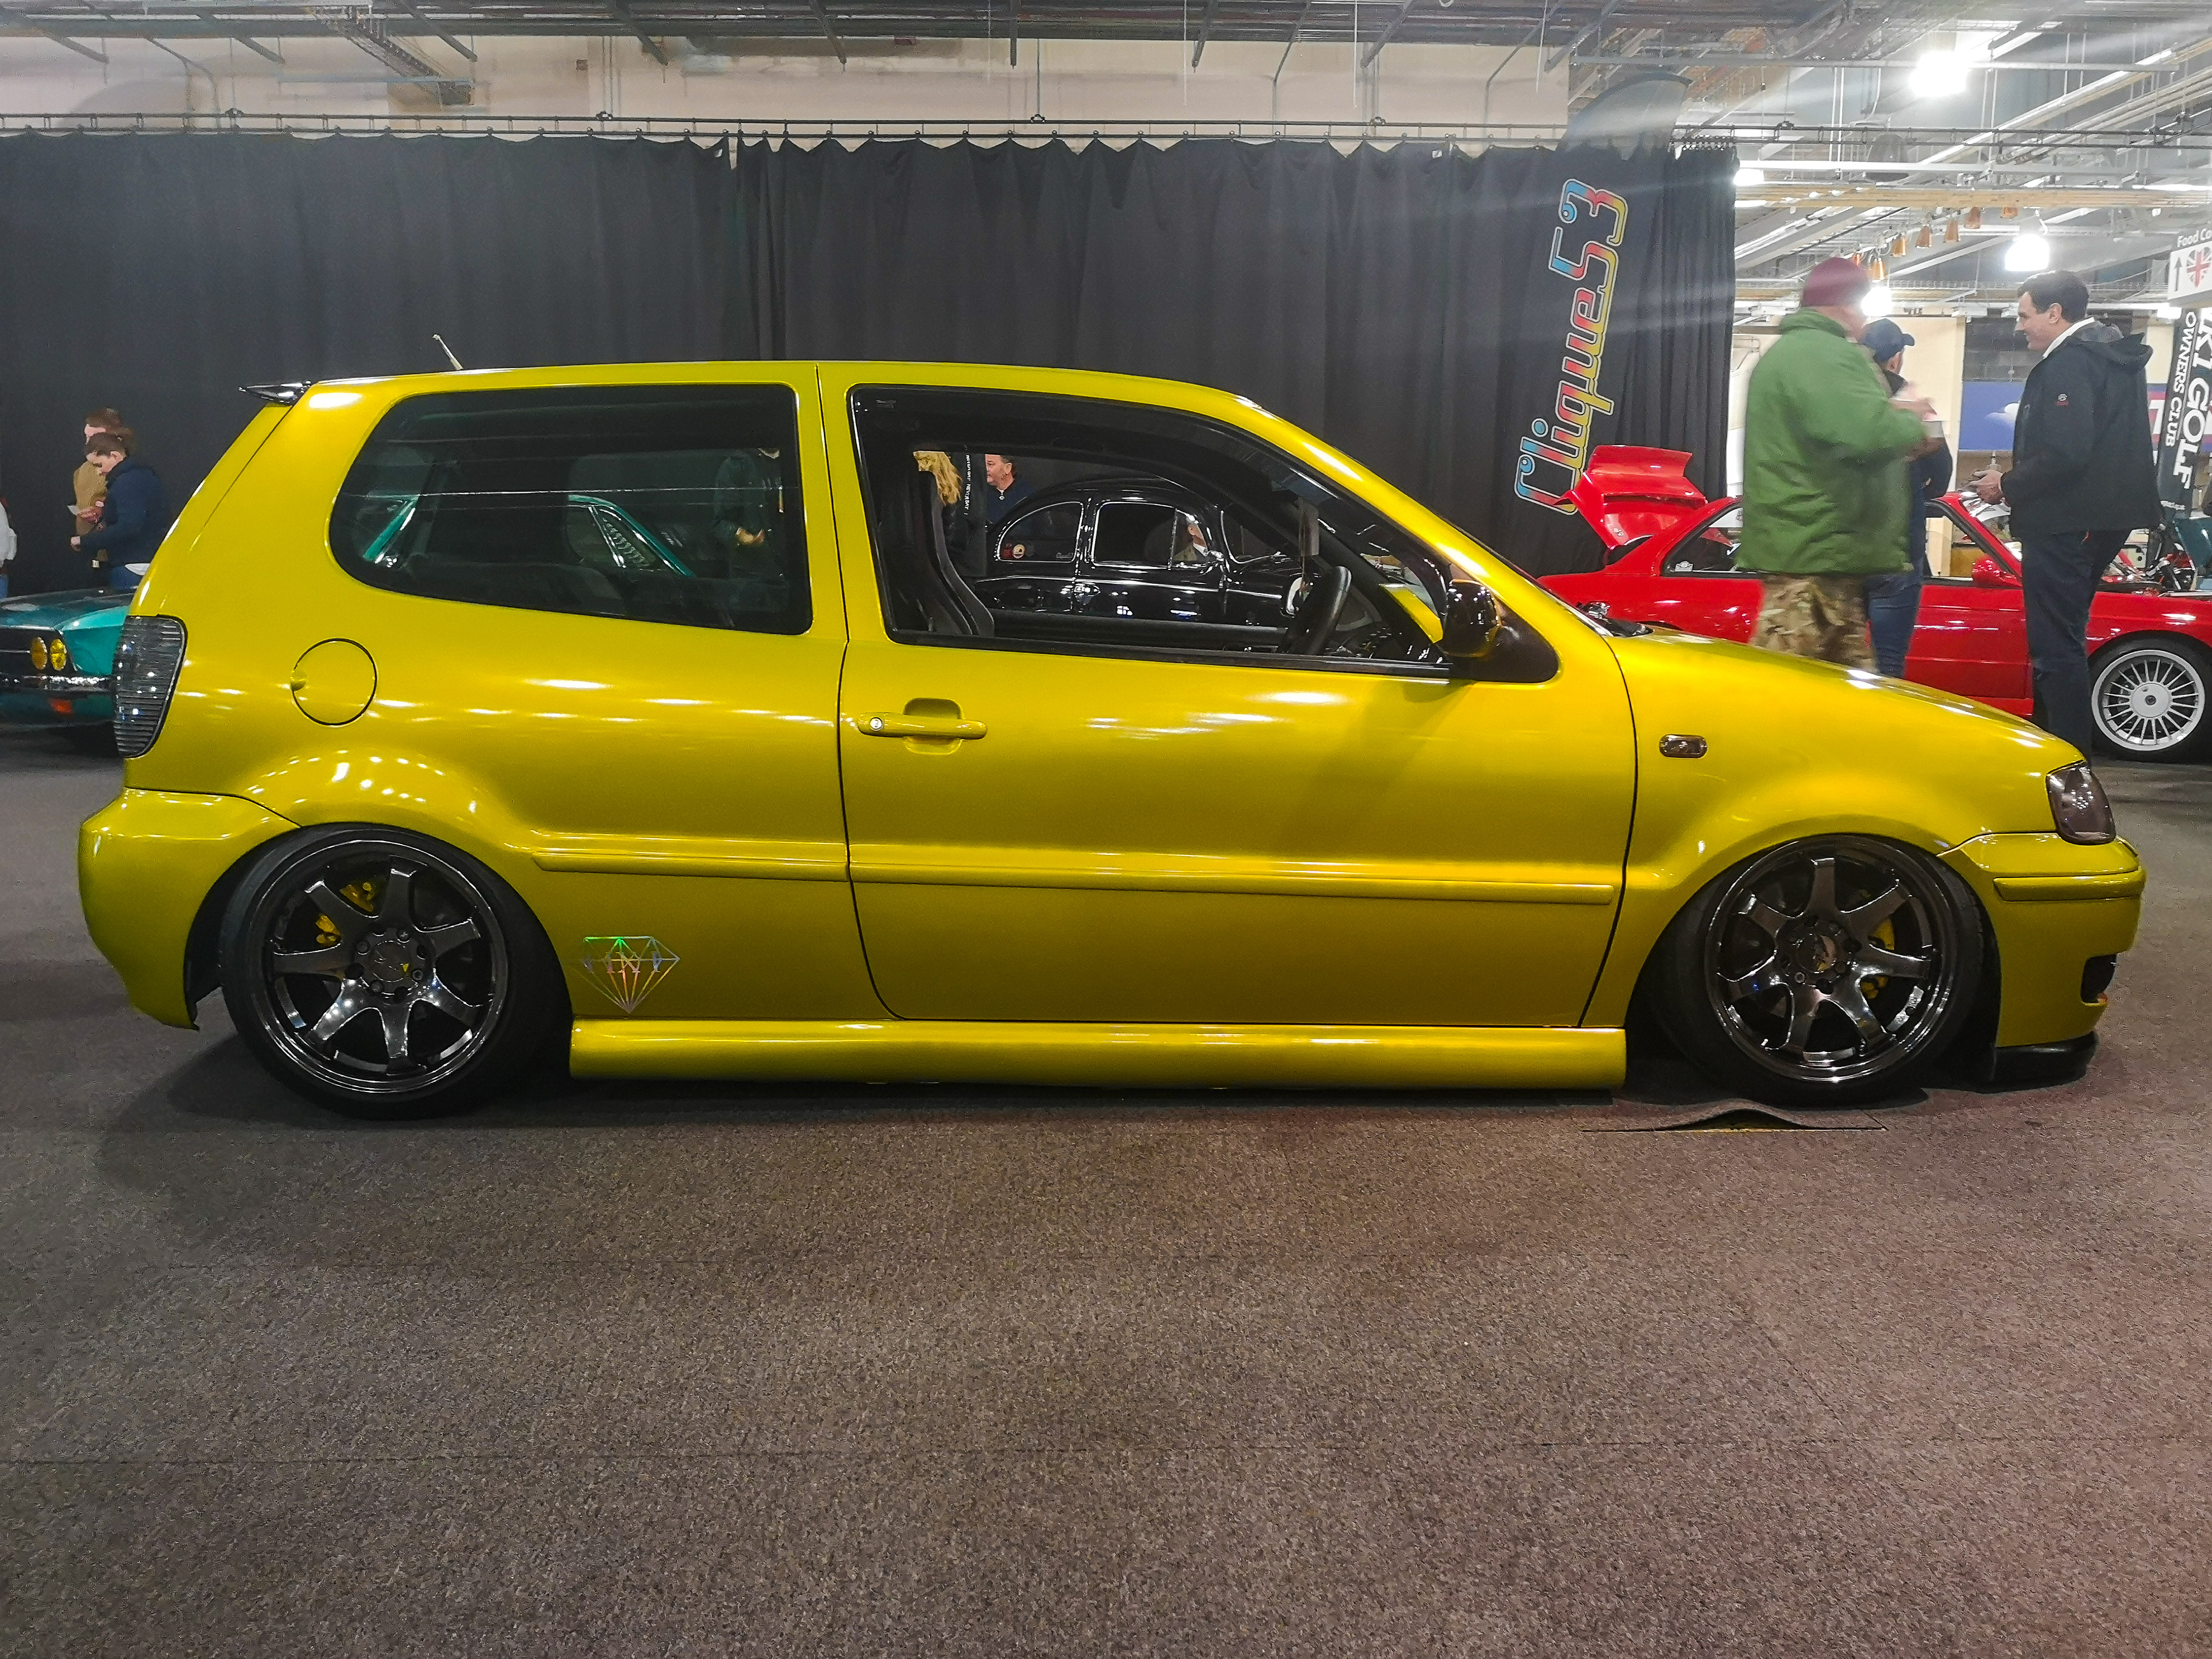 Gold VW Polo 6n Slammed